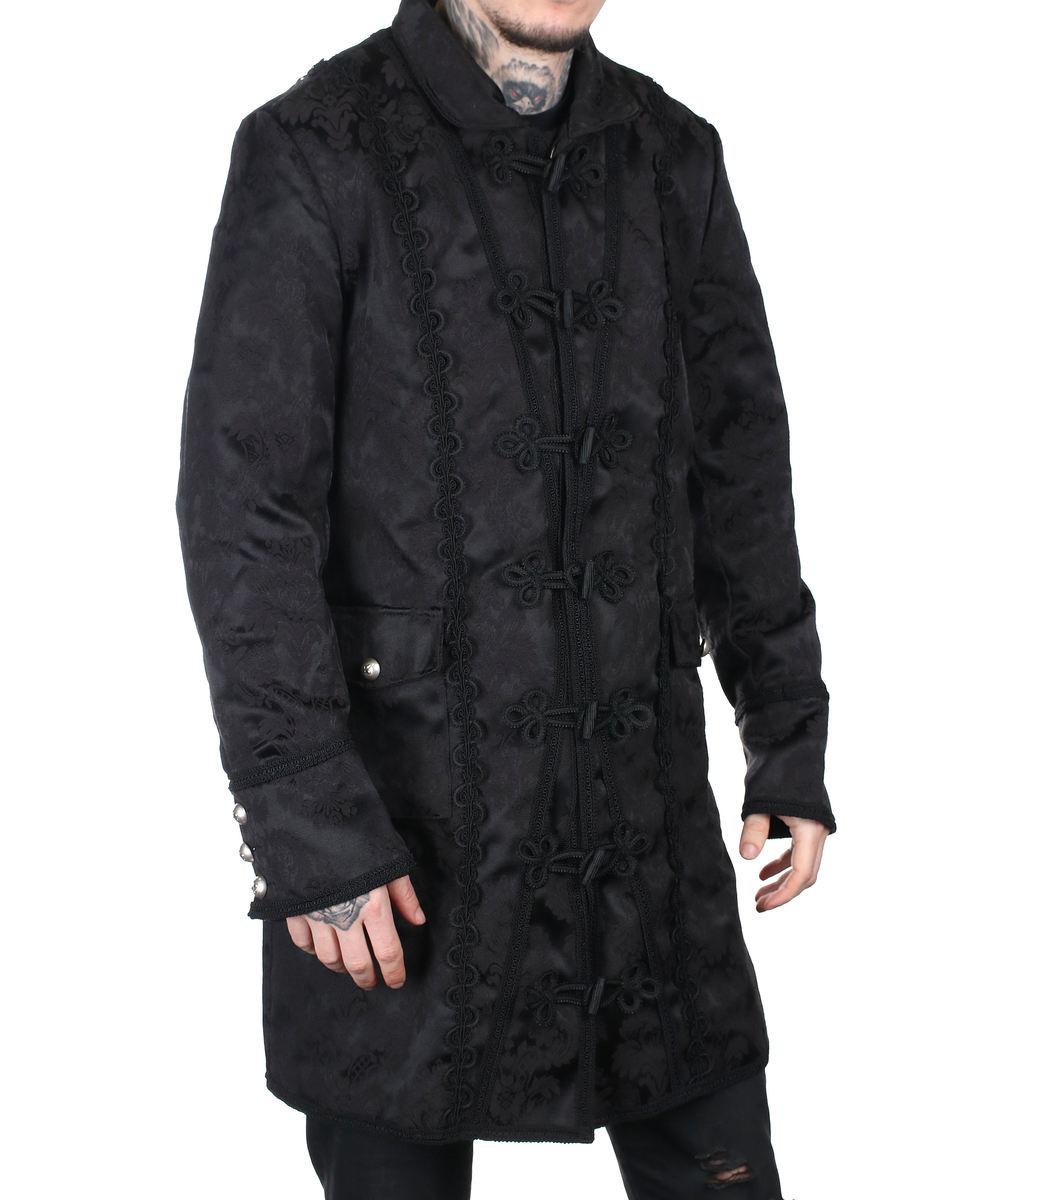 kabát pánsky Aderlass - Classic Coat Brocade Black - A-7-03-040-00